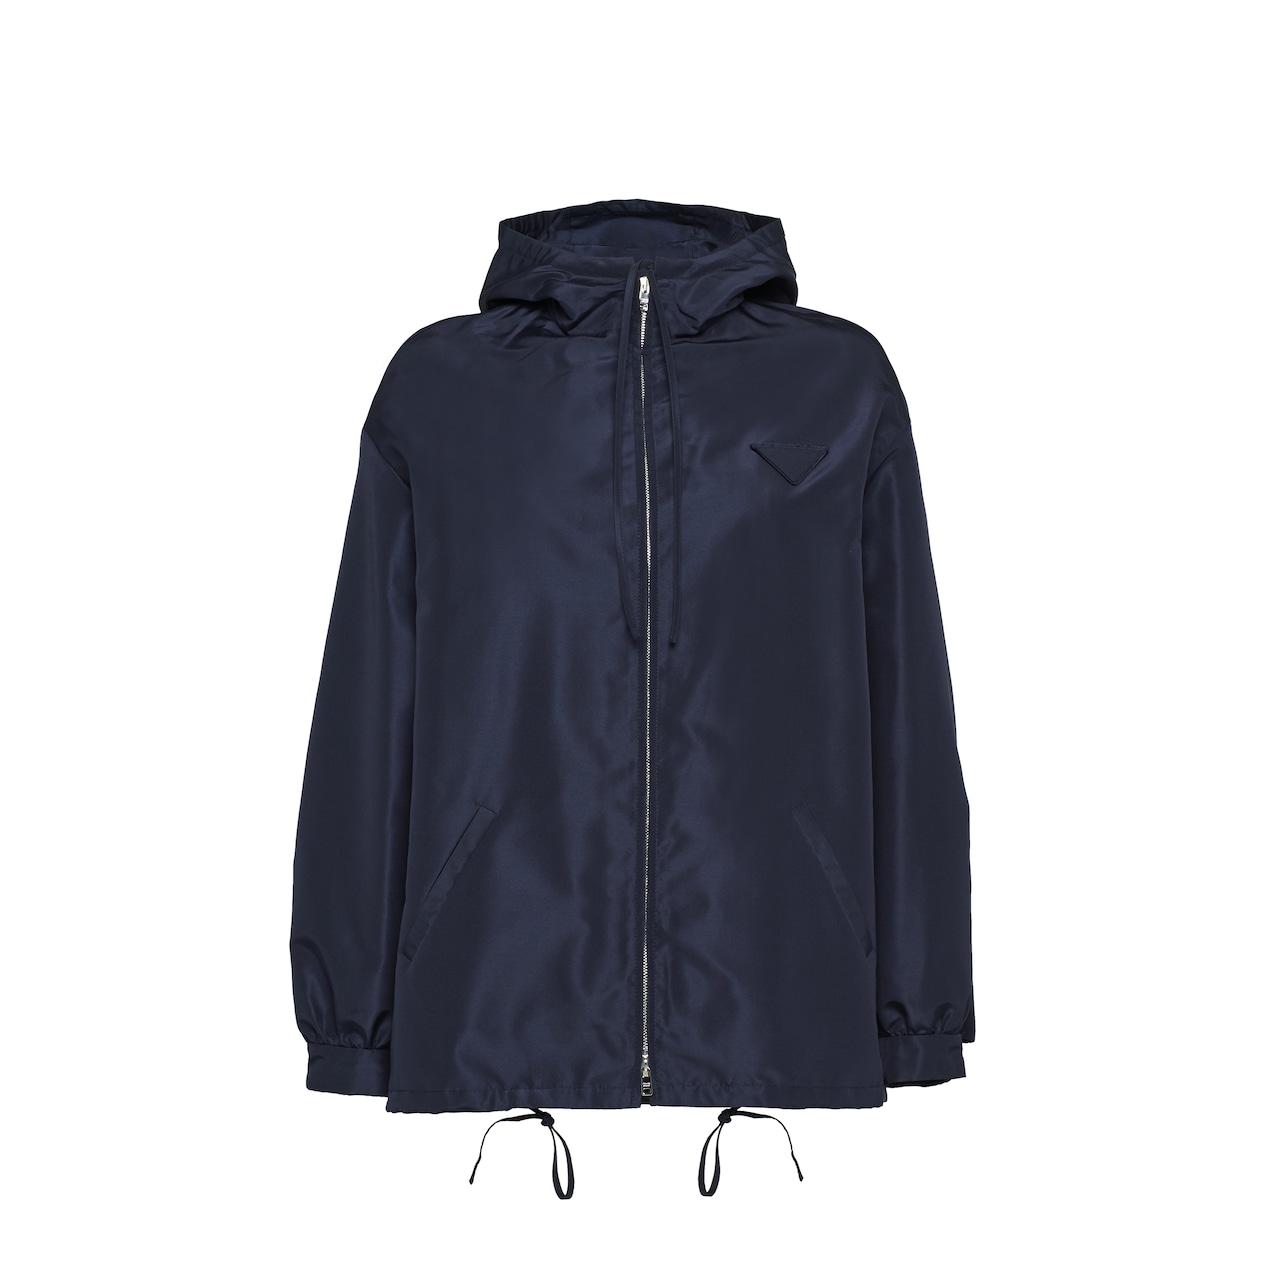 Prada Silk faille caban jacket 1